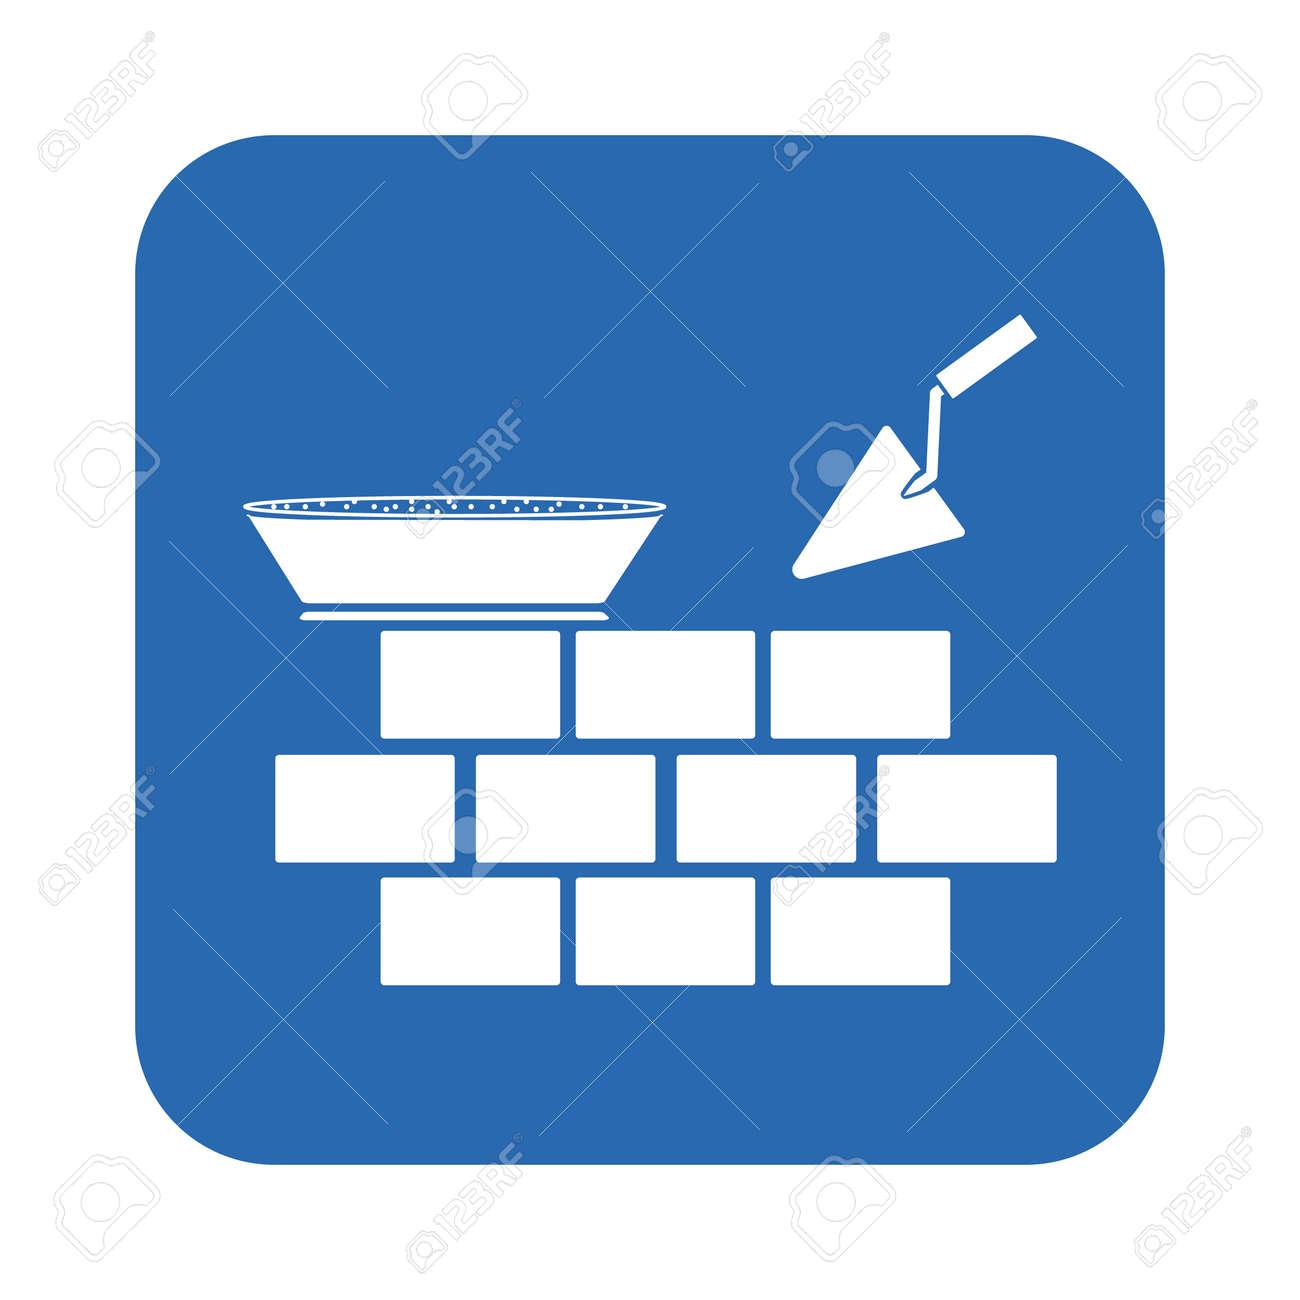 Brickwork icon - 50294822